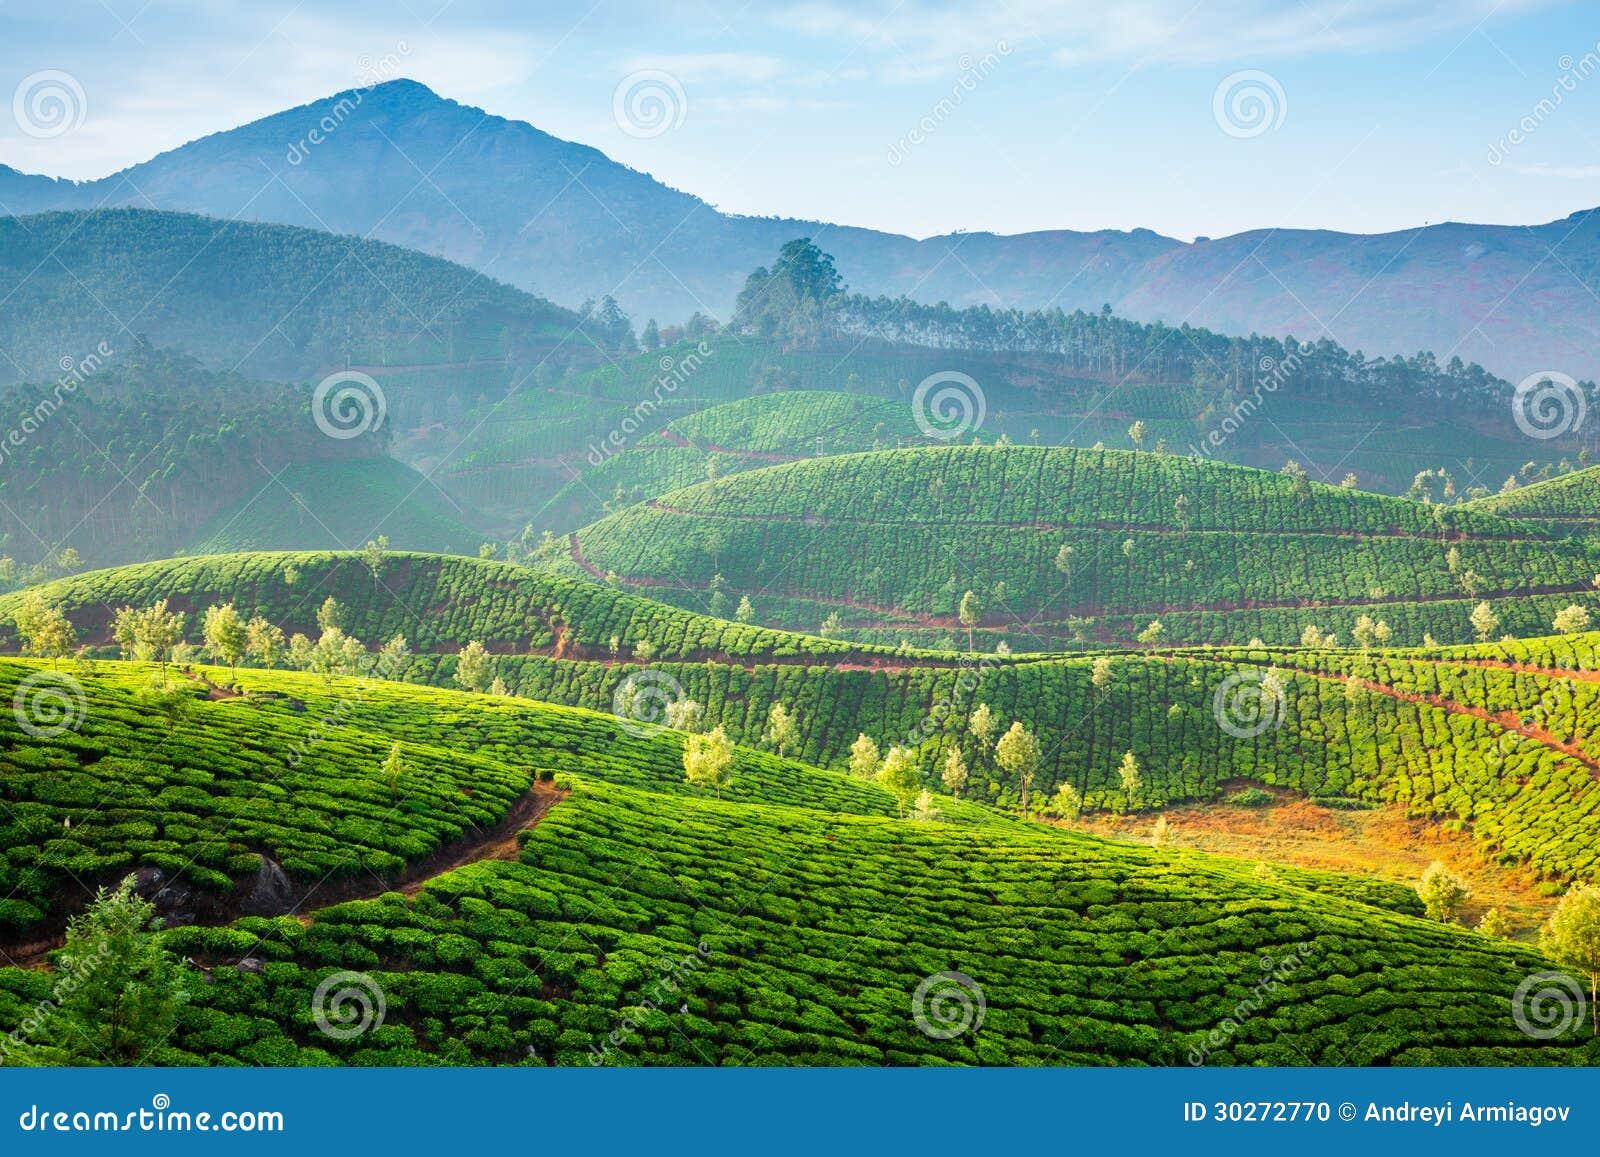 Landscape of the tea plantations in India, Kerala Munnar.